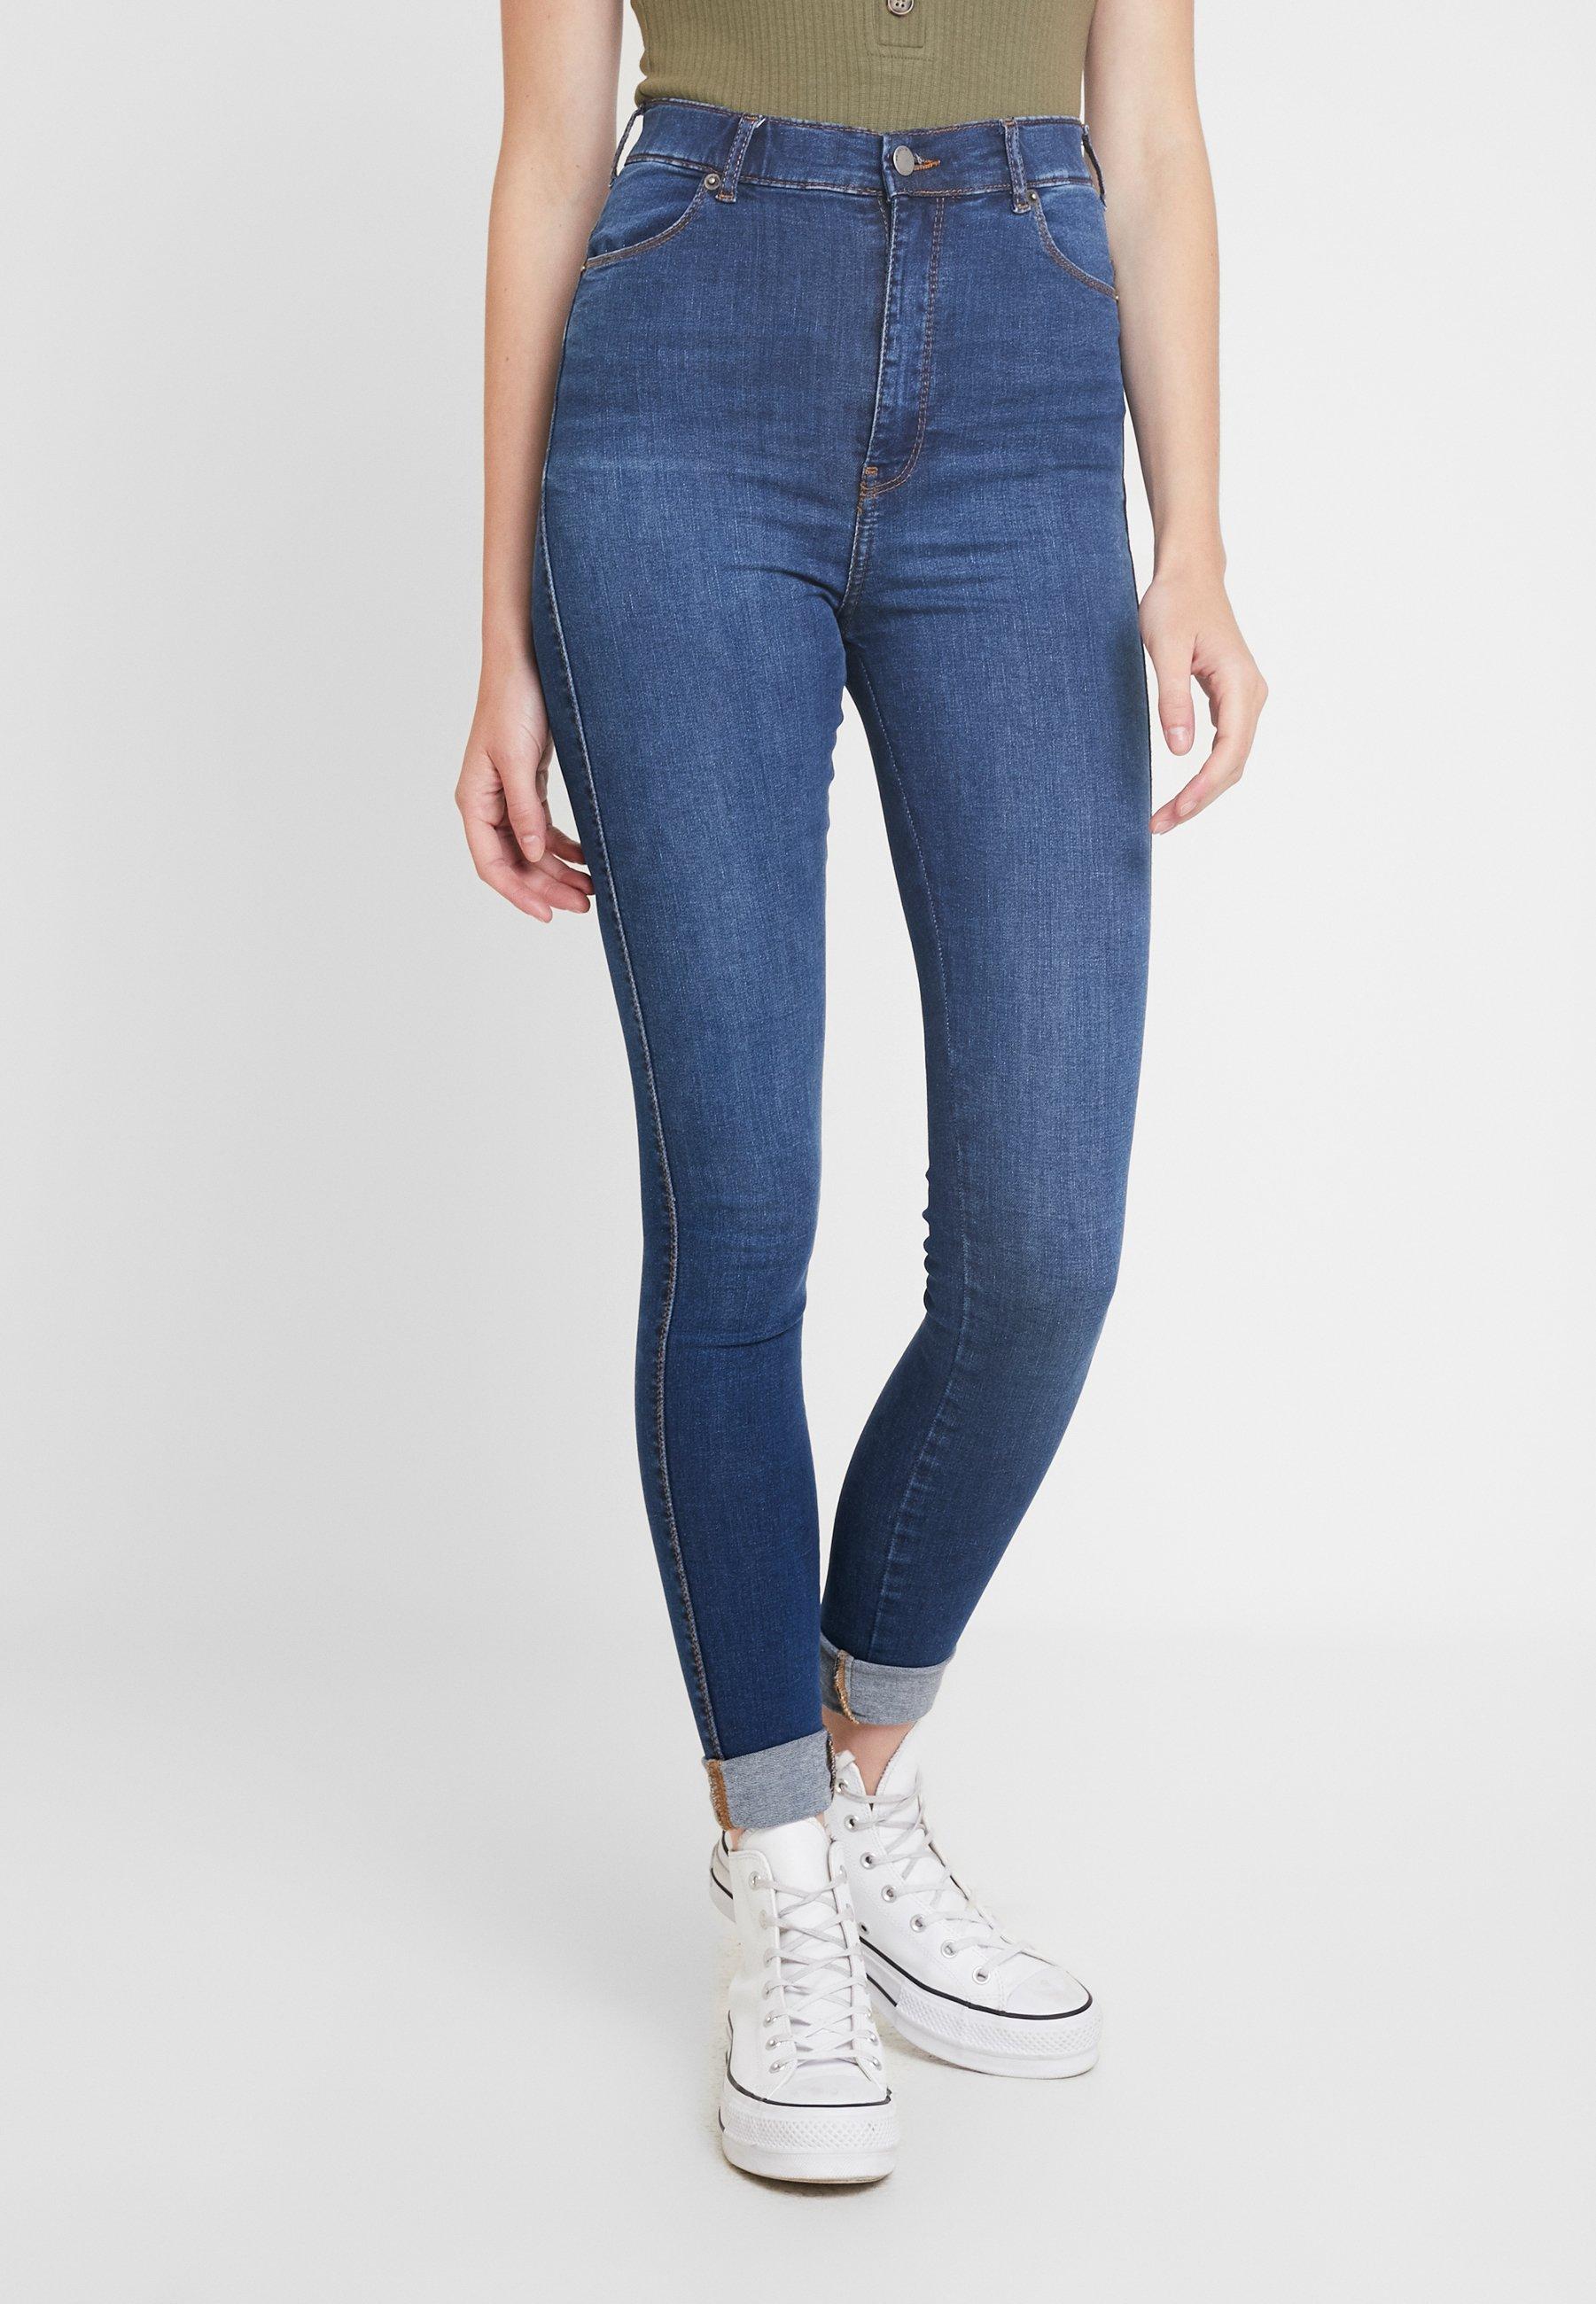 Tall Skinny Atlantic WaistJeans Deep Dr Moxy High Blue denim uOXTZwklPi